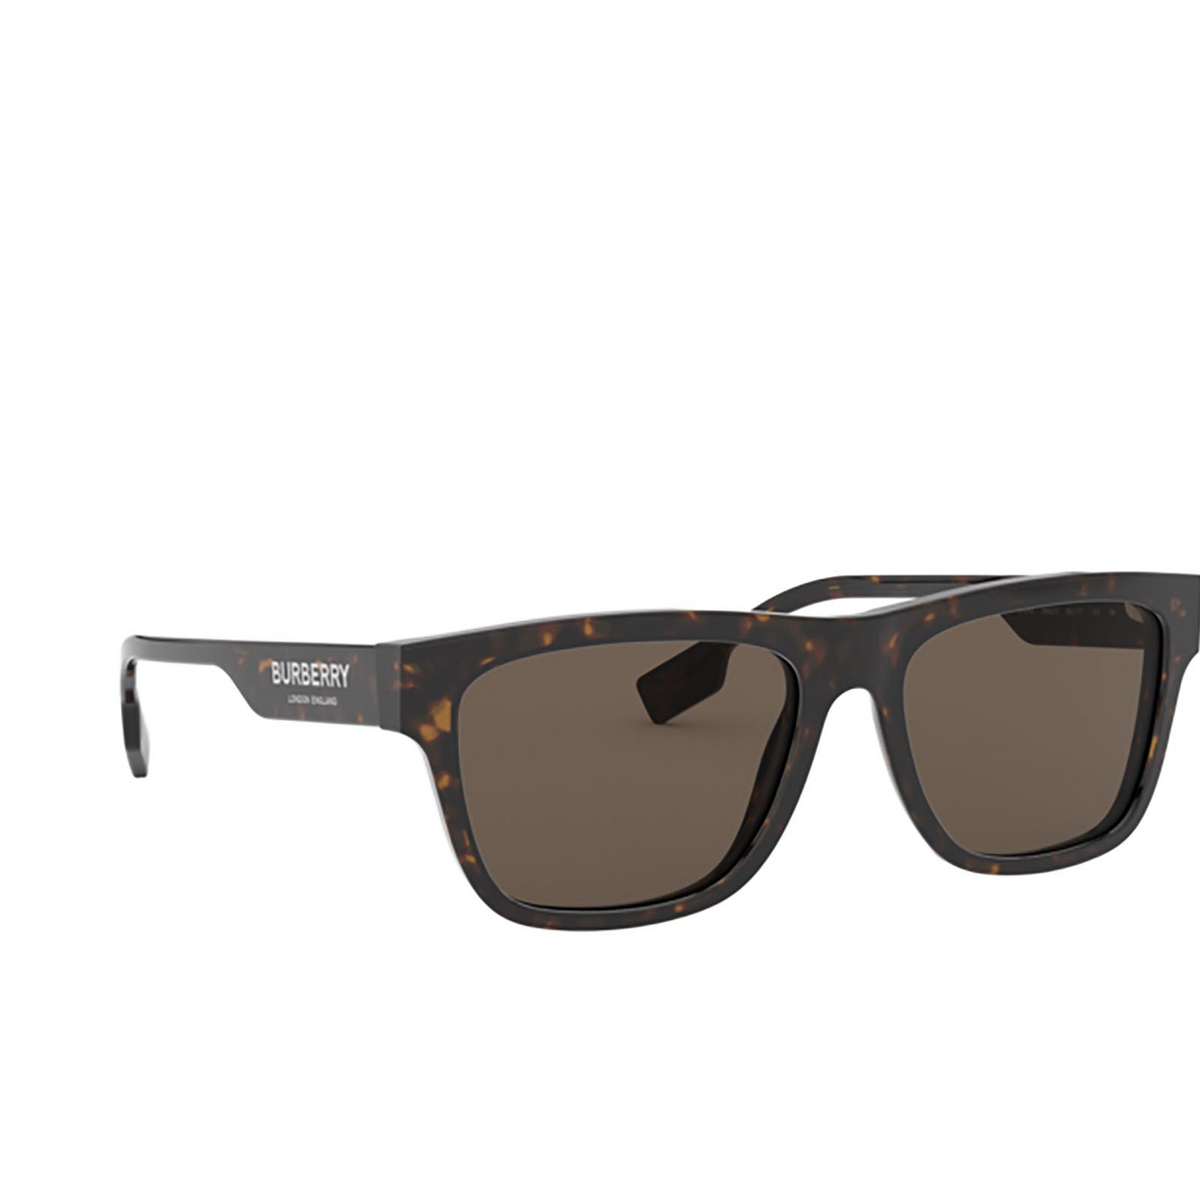 Burberry® Square Sunglasses: BE4293 color Dark Havana 3002/3 - three-quarters view.